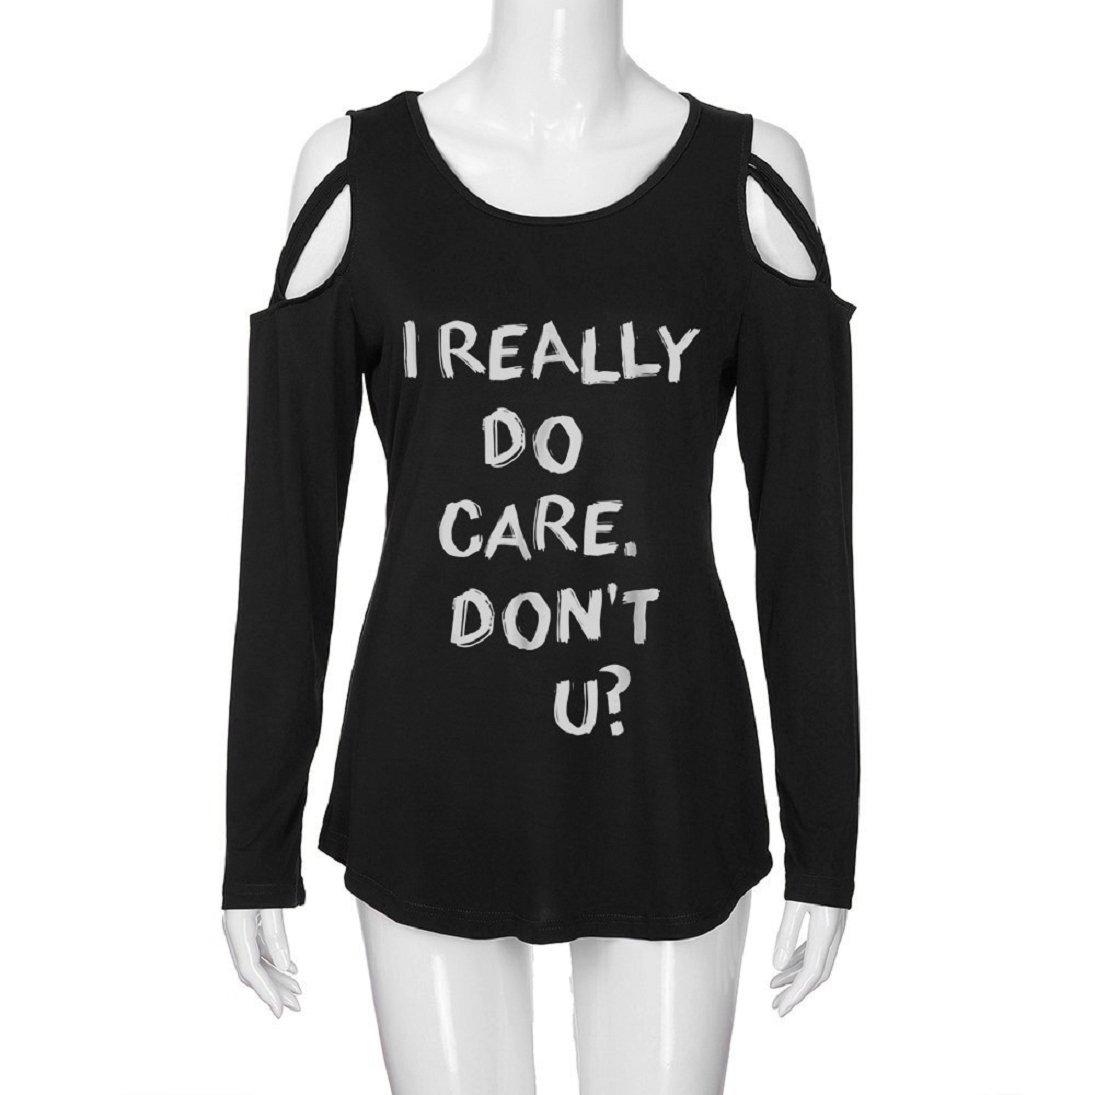 Camiseta de manga larga para mujer, diseño con texto